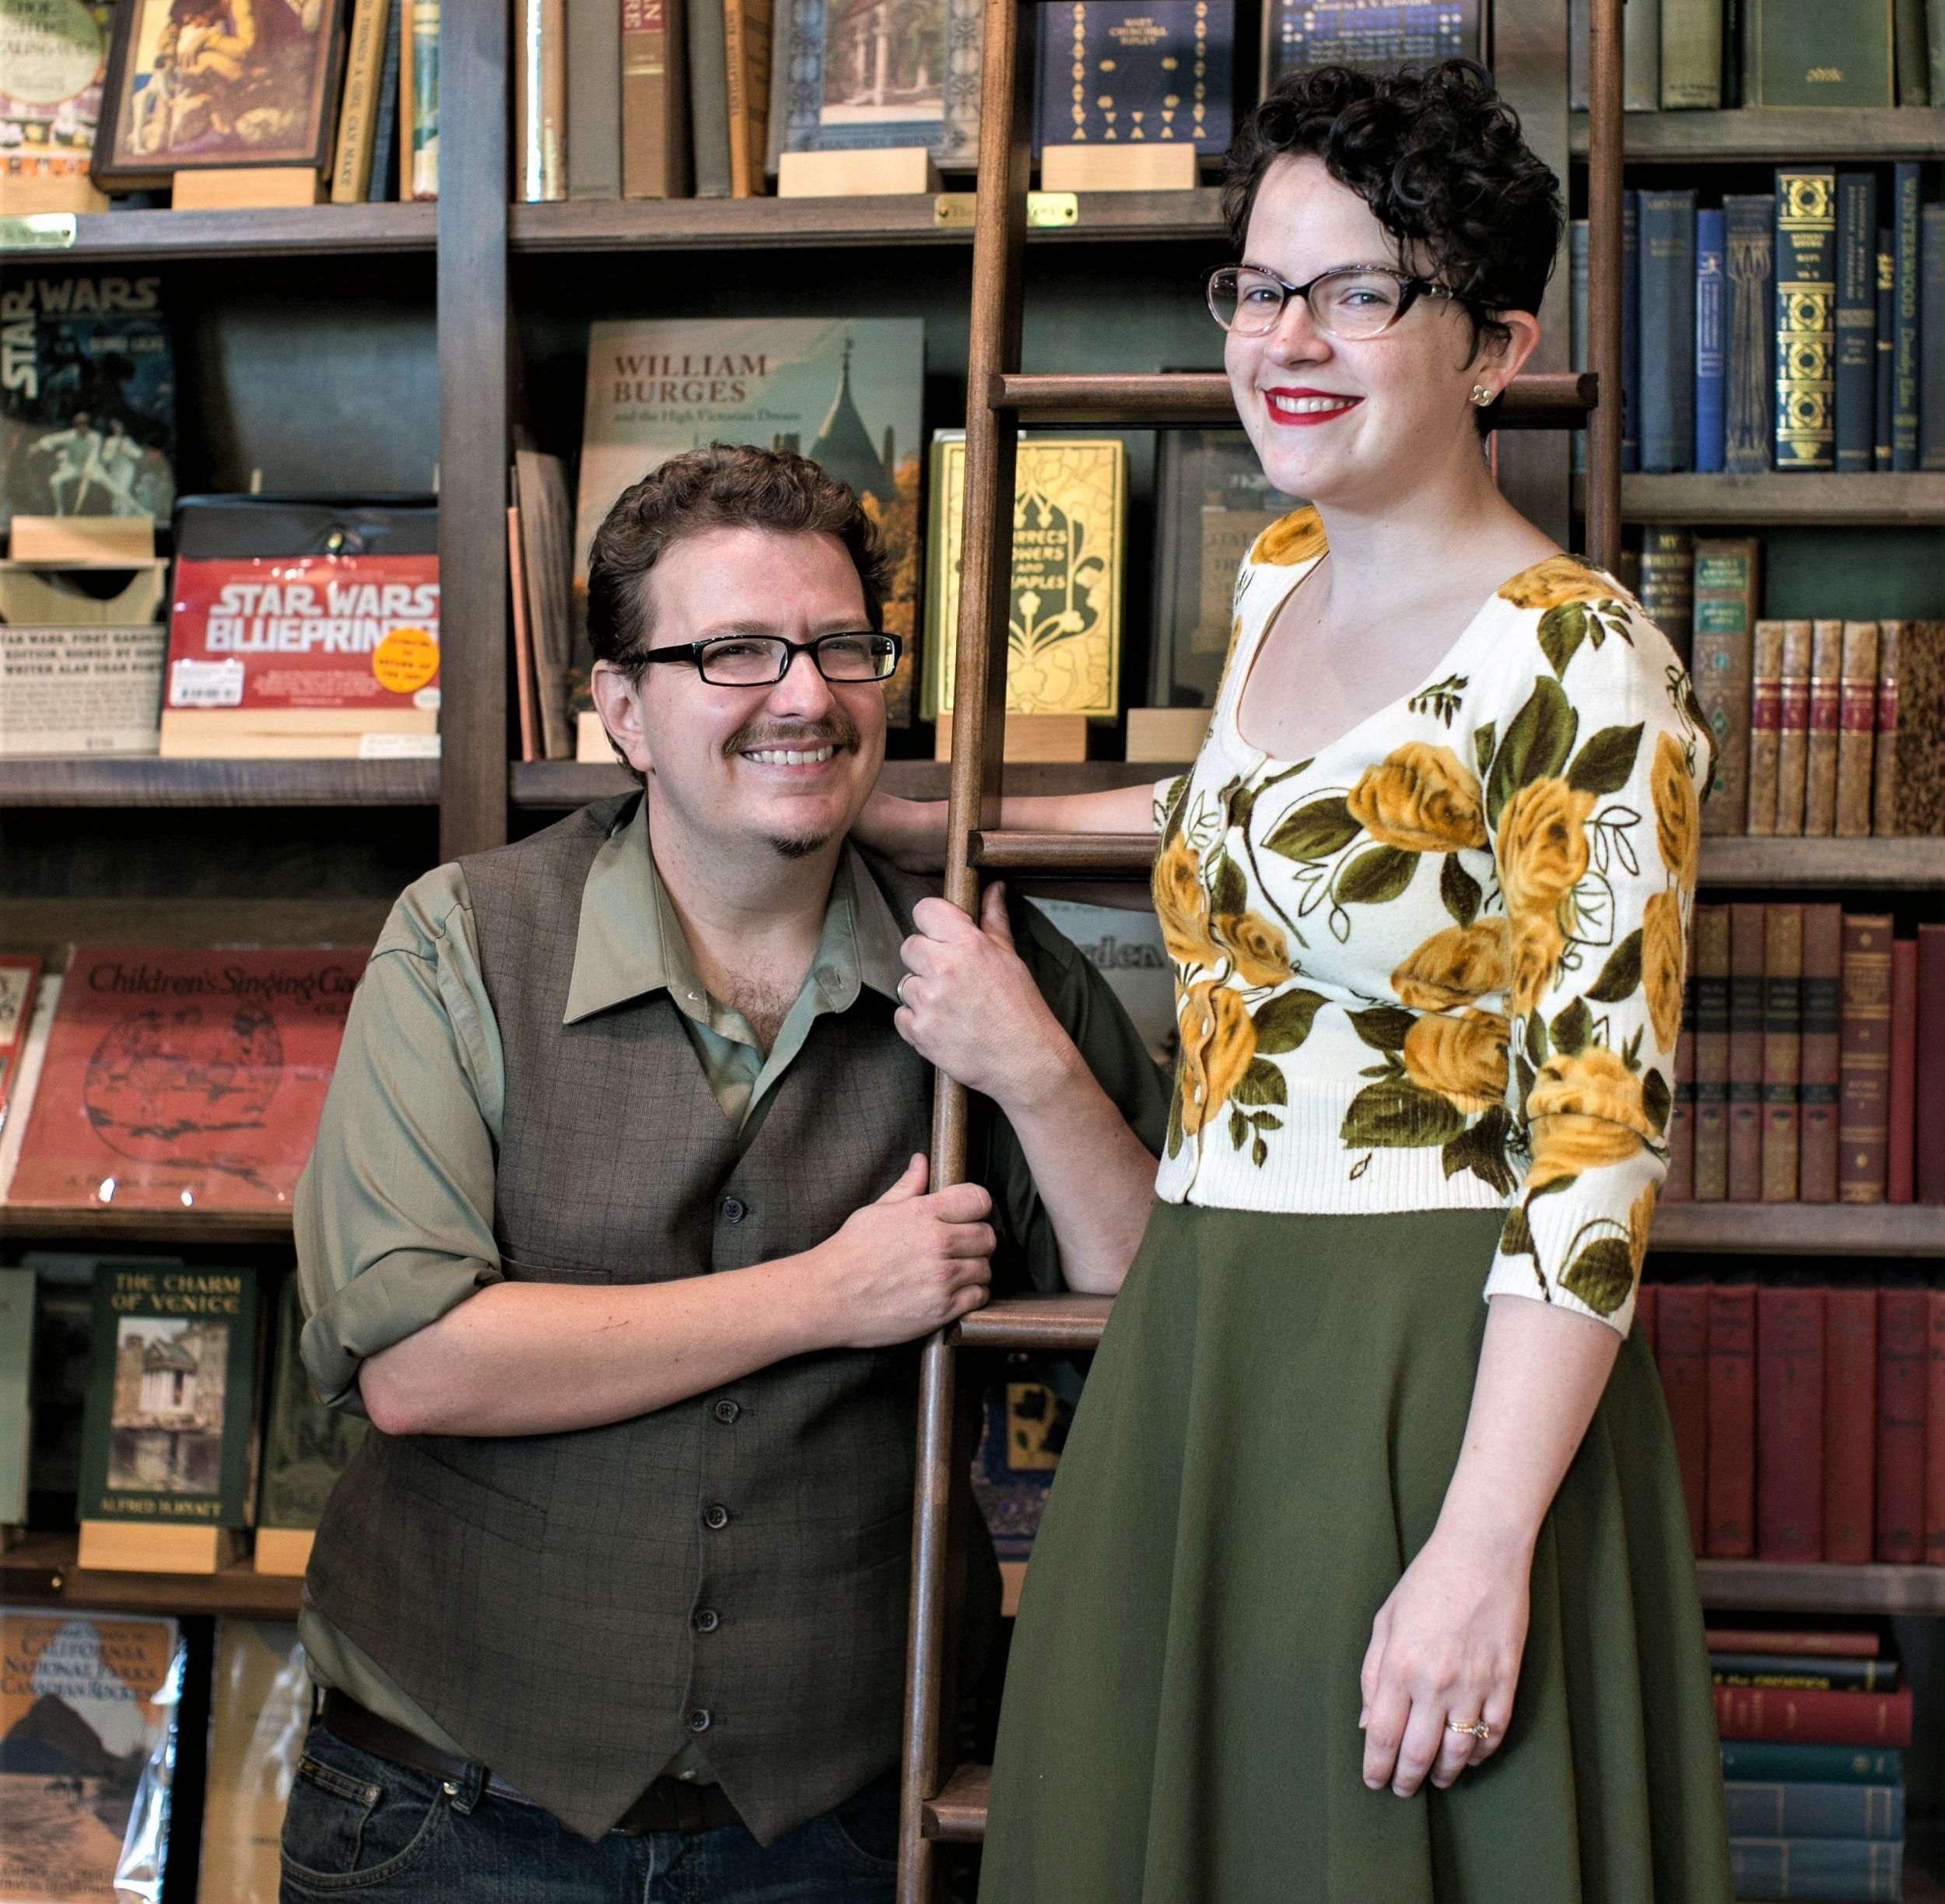 Megan+%26+Josh+ladder.jpg